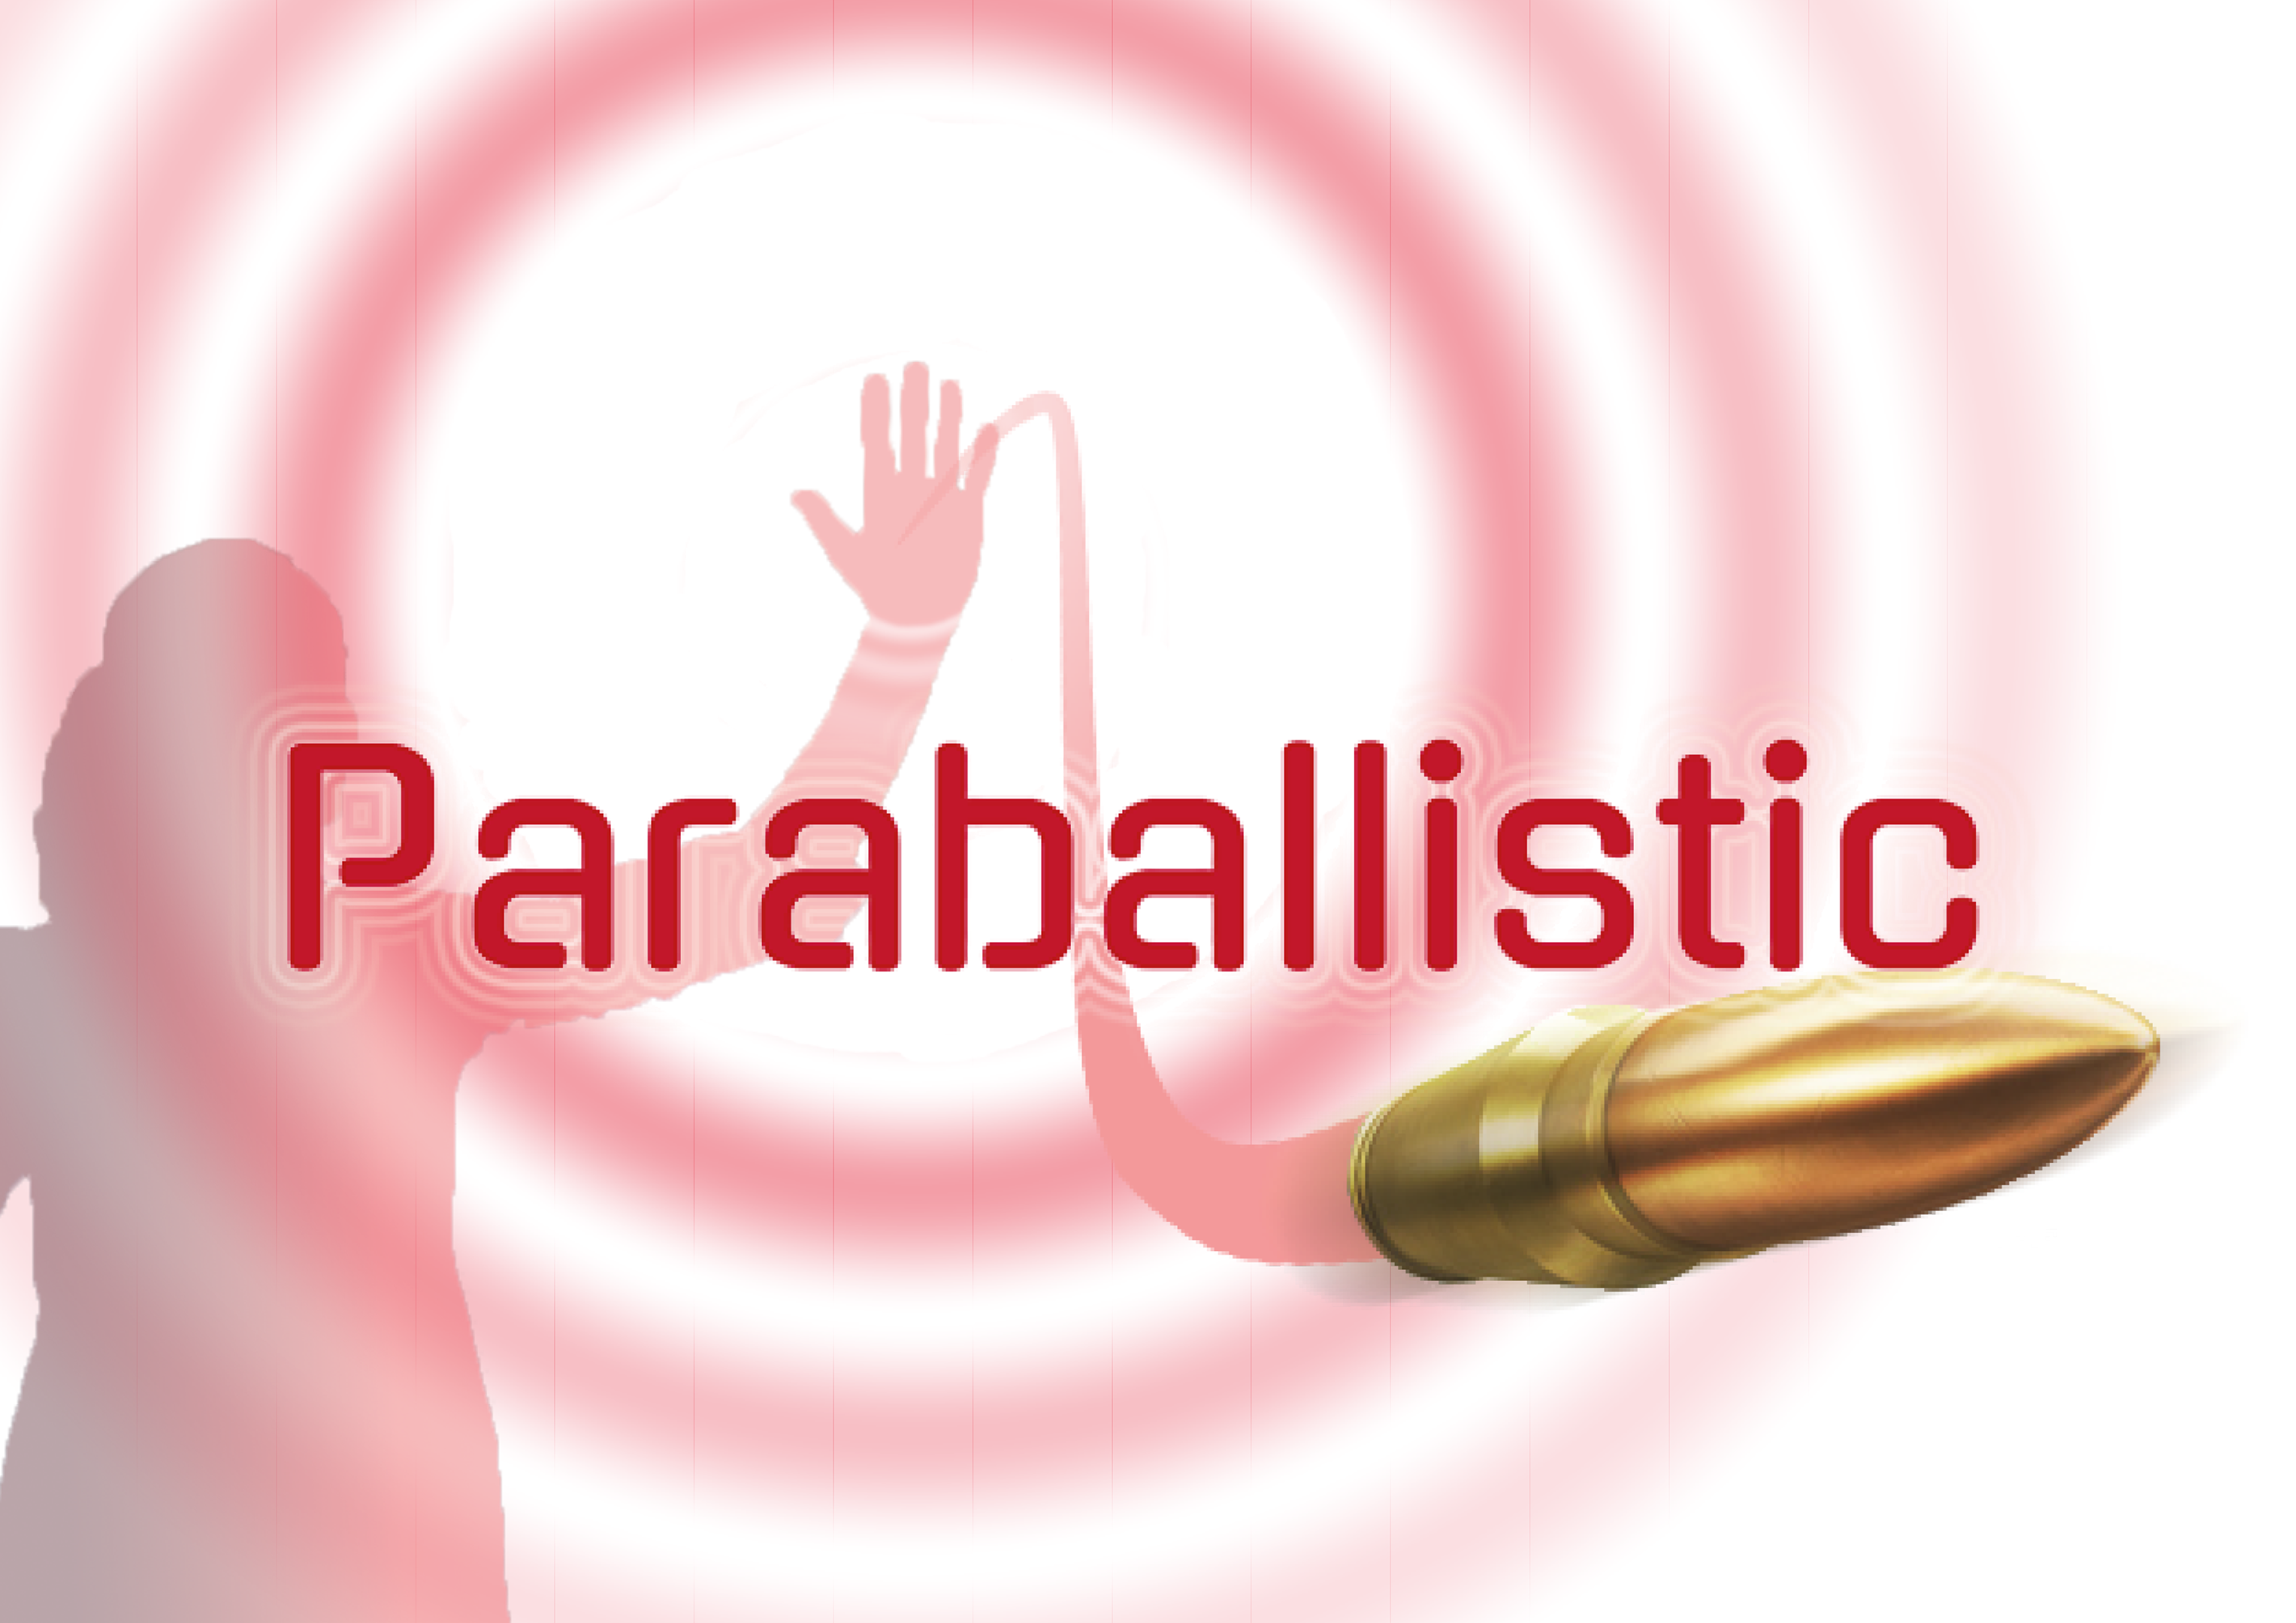 Paraballistic